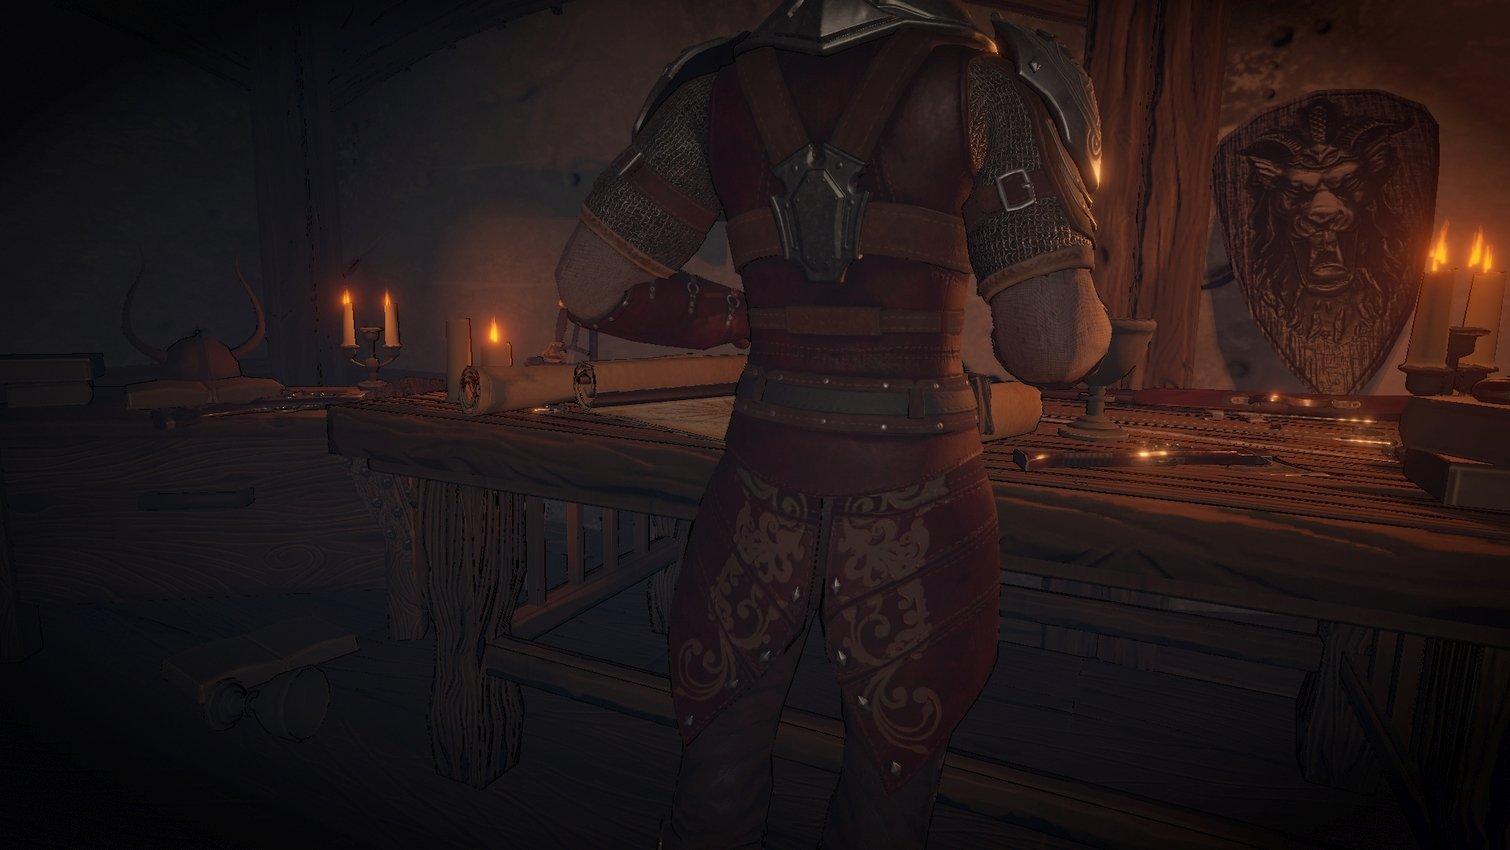 Pyramid Games Announces Dark Fantasy Game Kingslayer Tactics This Year